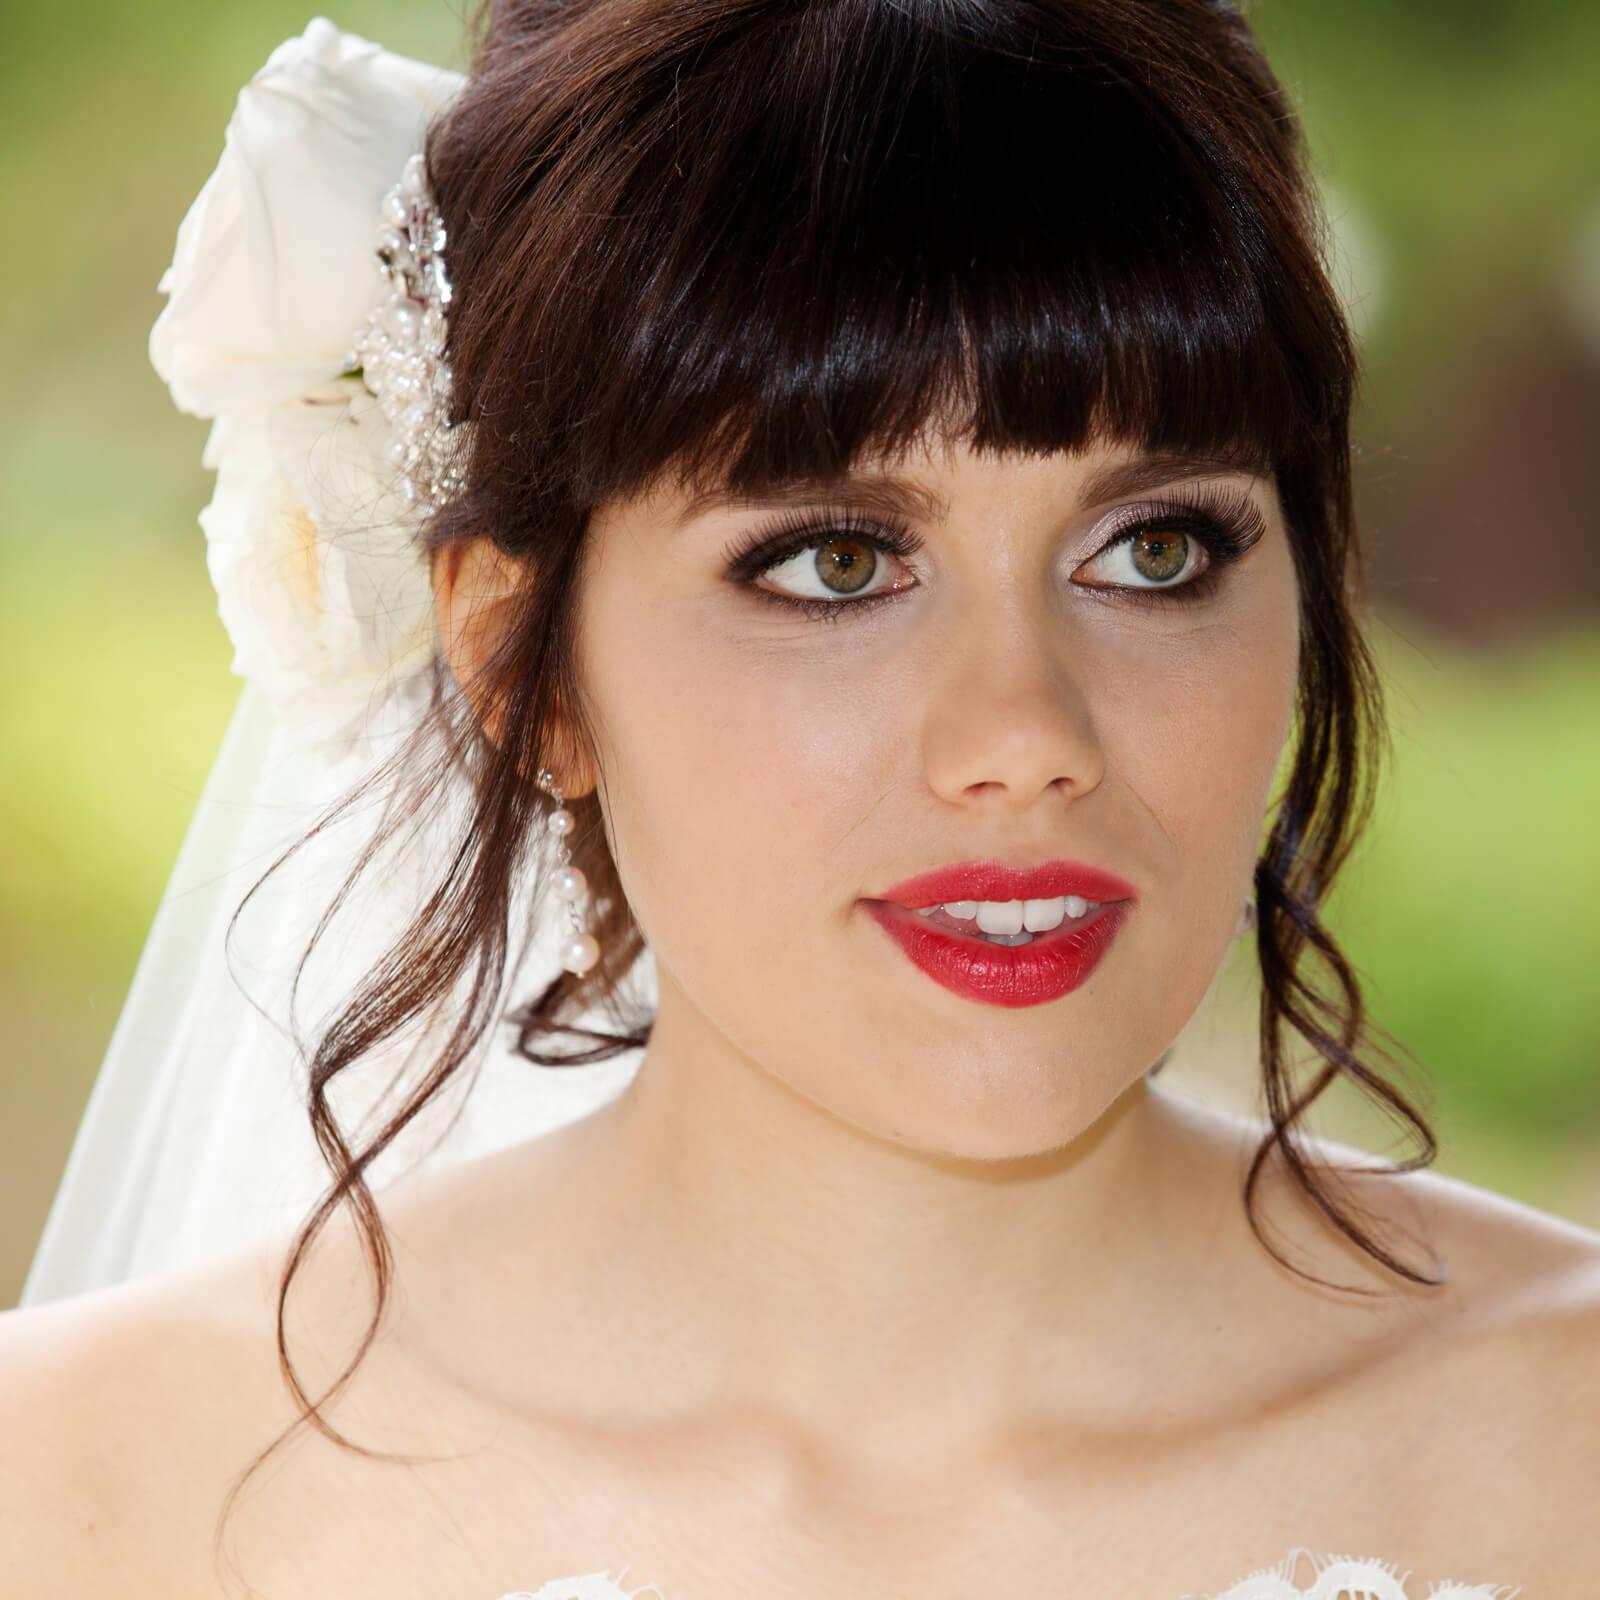 Warwickshire-wedding-photographer-Tara-Alex-2